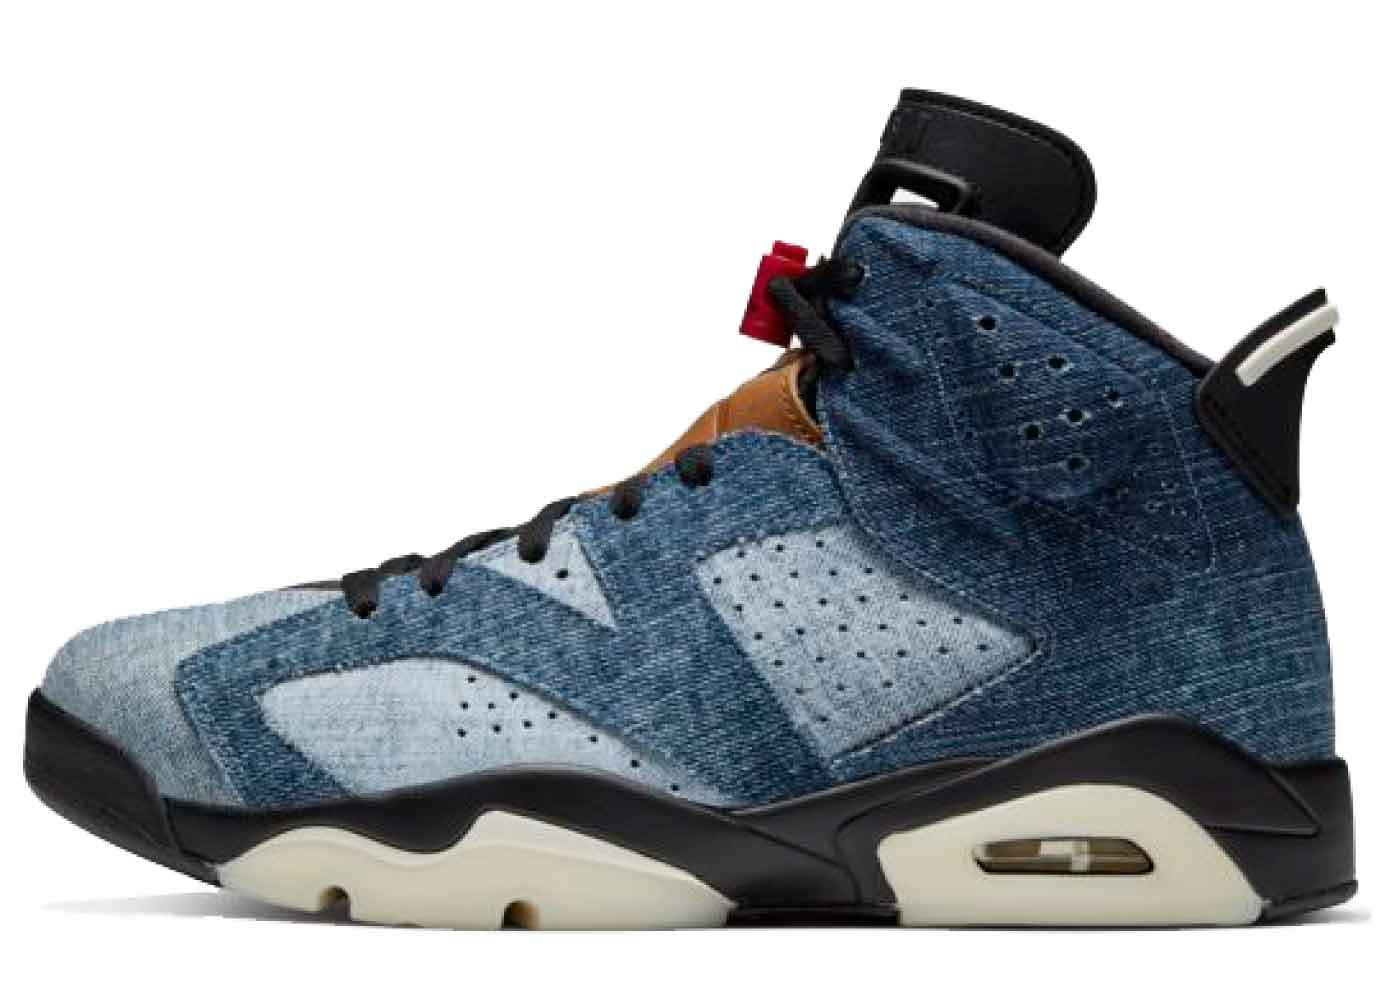 Nike Air Jordan 6 Retro Washed Denimの写真